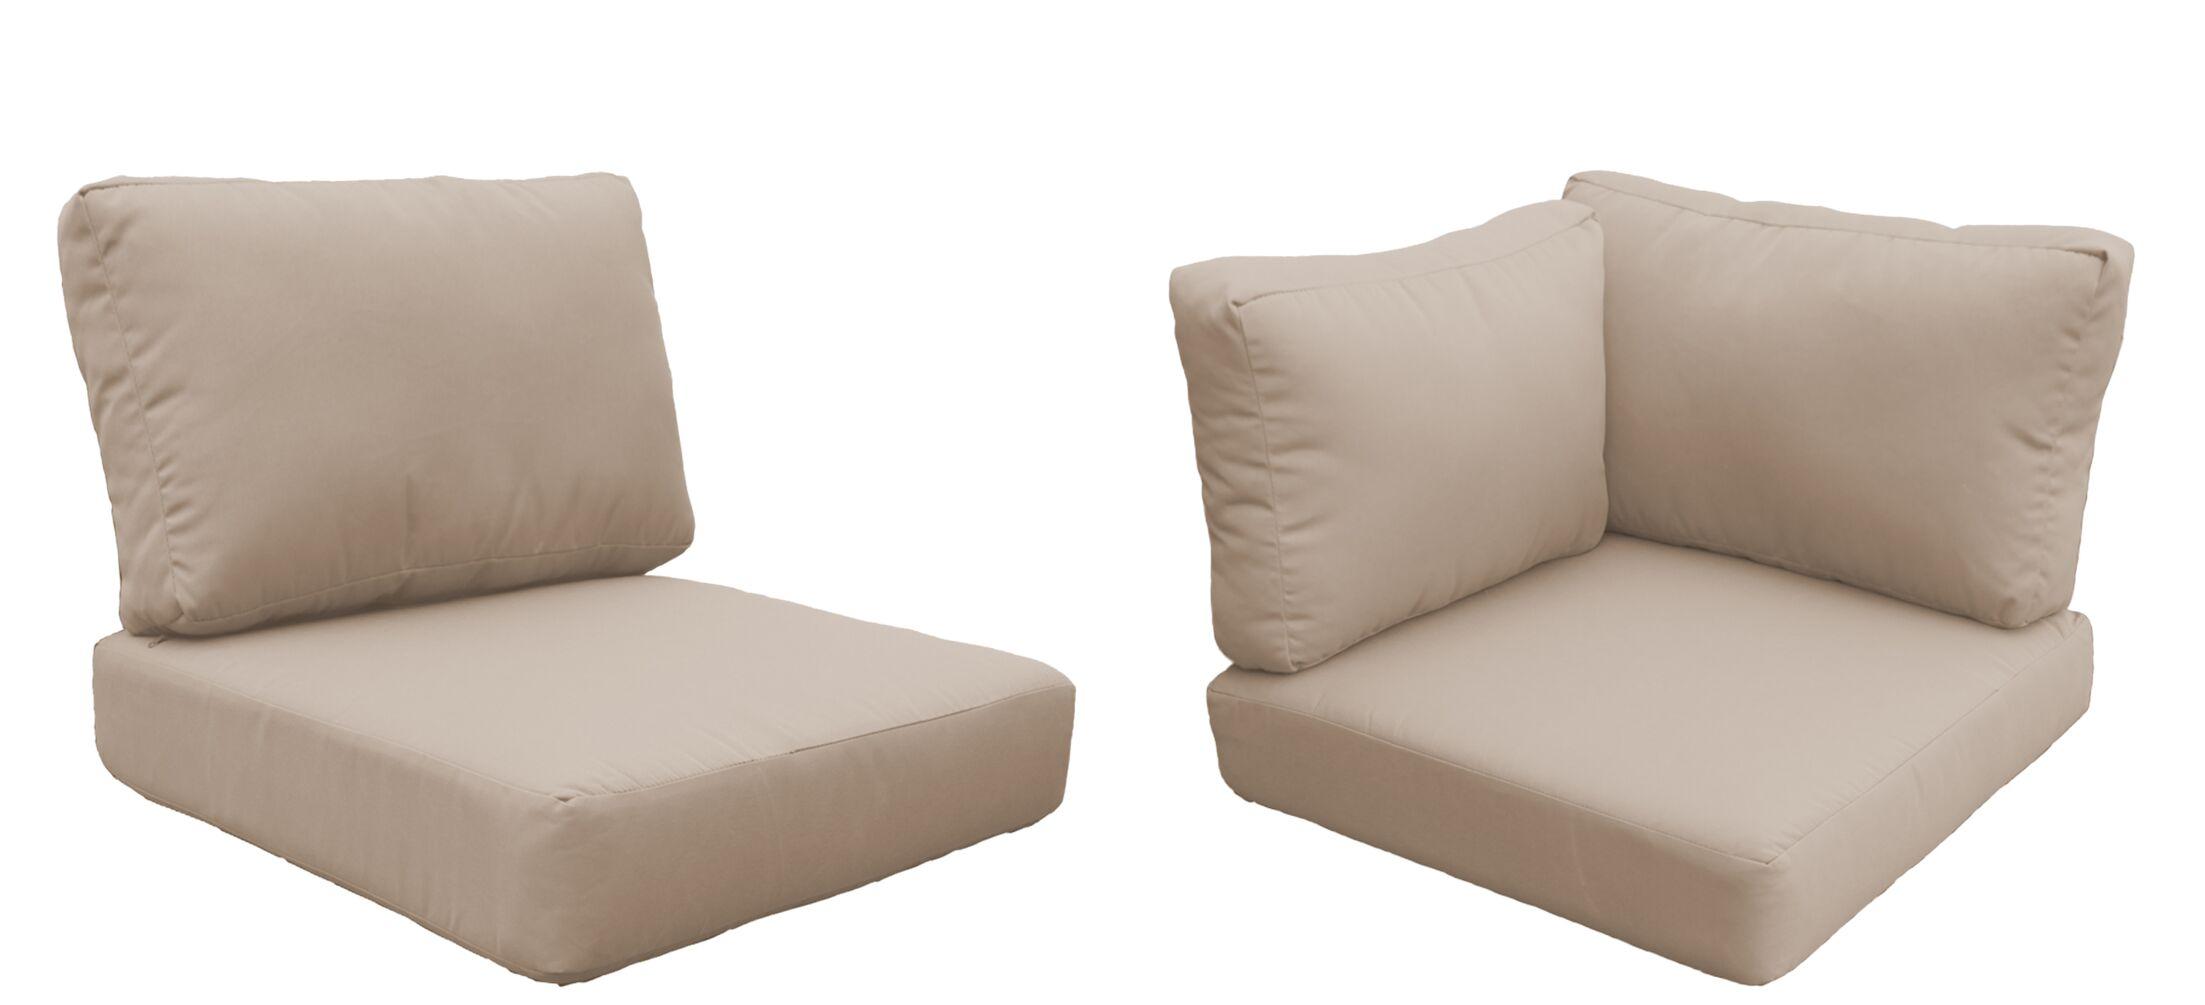 Eldredge 15 Piece Outdoor Cushion Set Fabric: Wheat